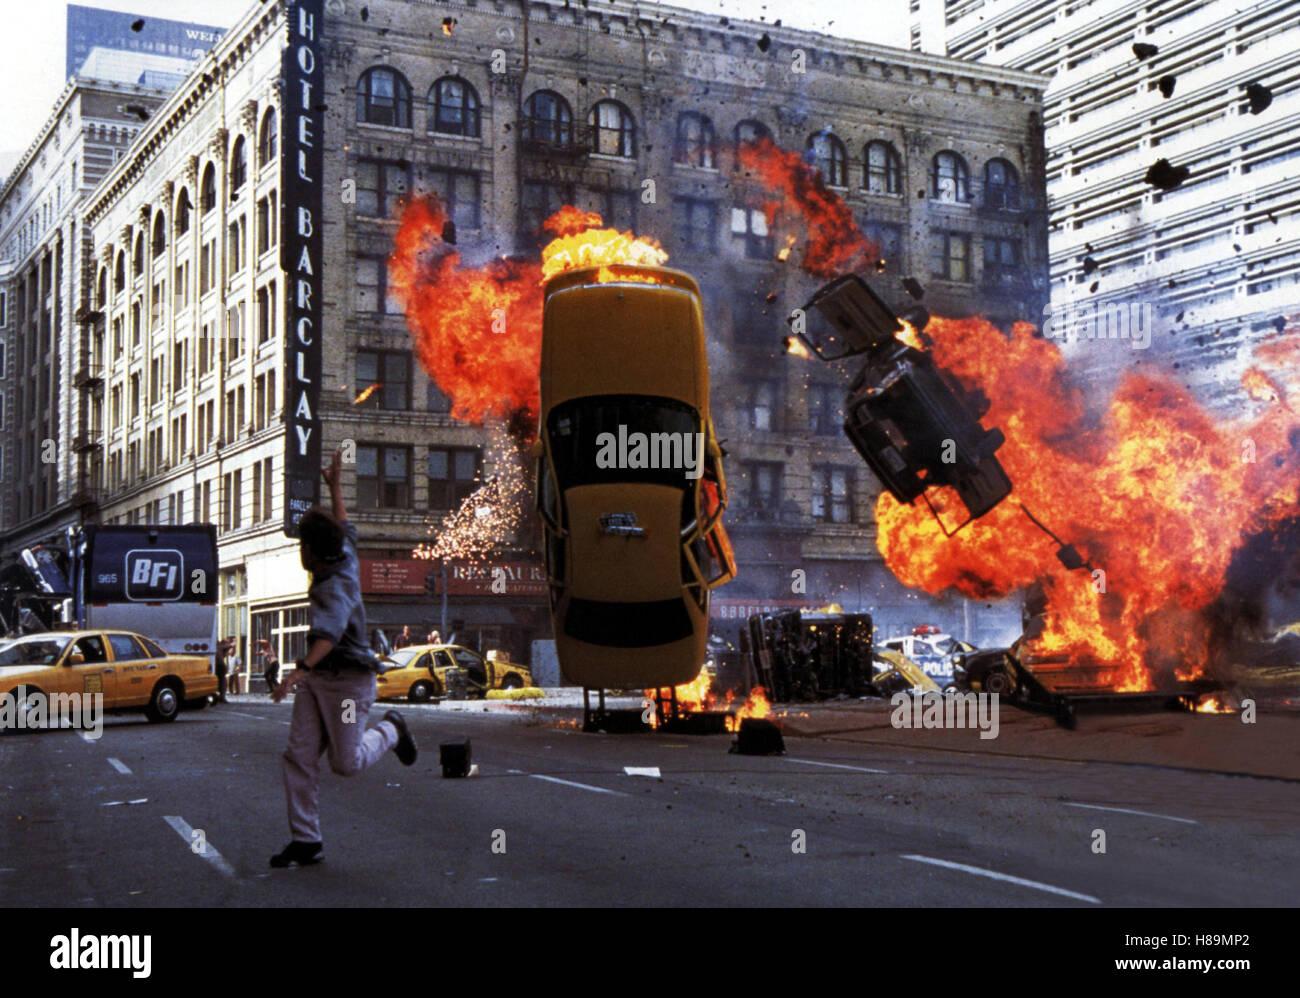 Armageddon - Das jüngste Gericht, (ARMAGEDDON) USA 1998, Regie: Michael Bay, Szene Stichwort: Explosion, Feuer, - Stock Image